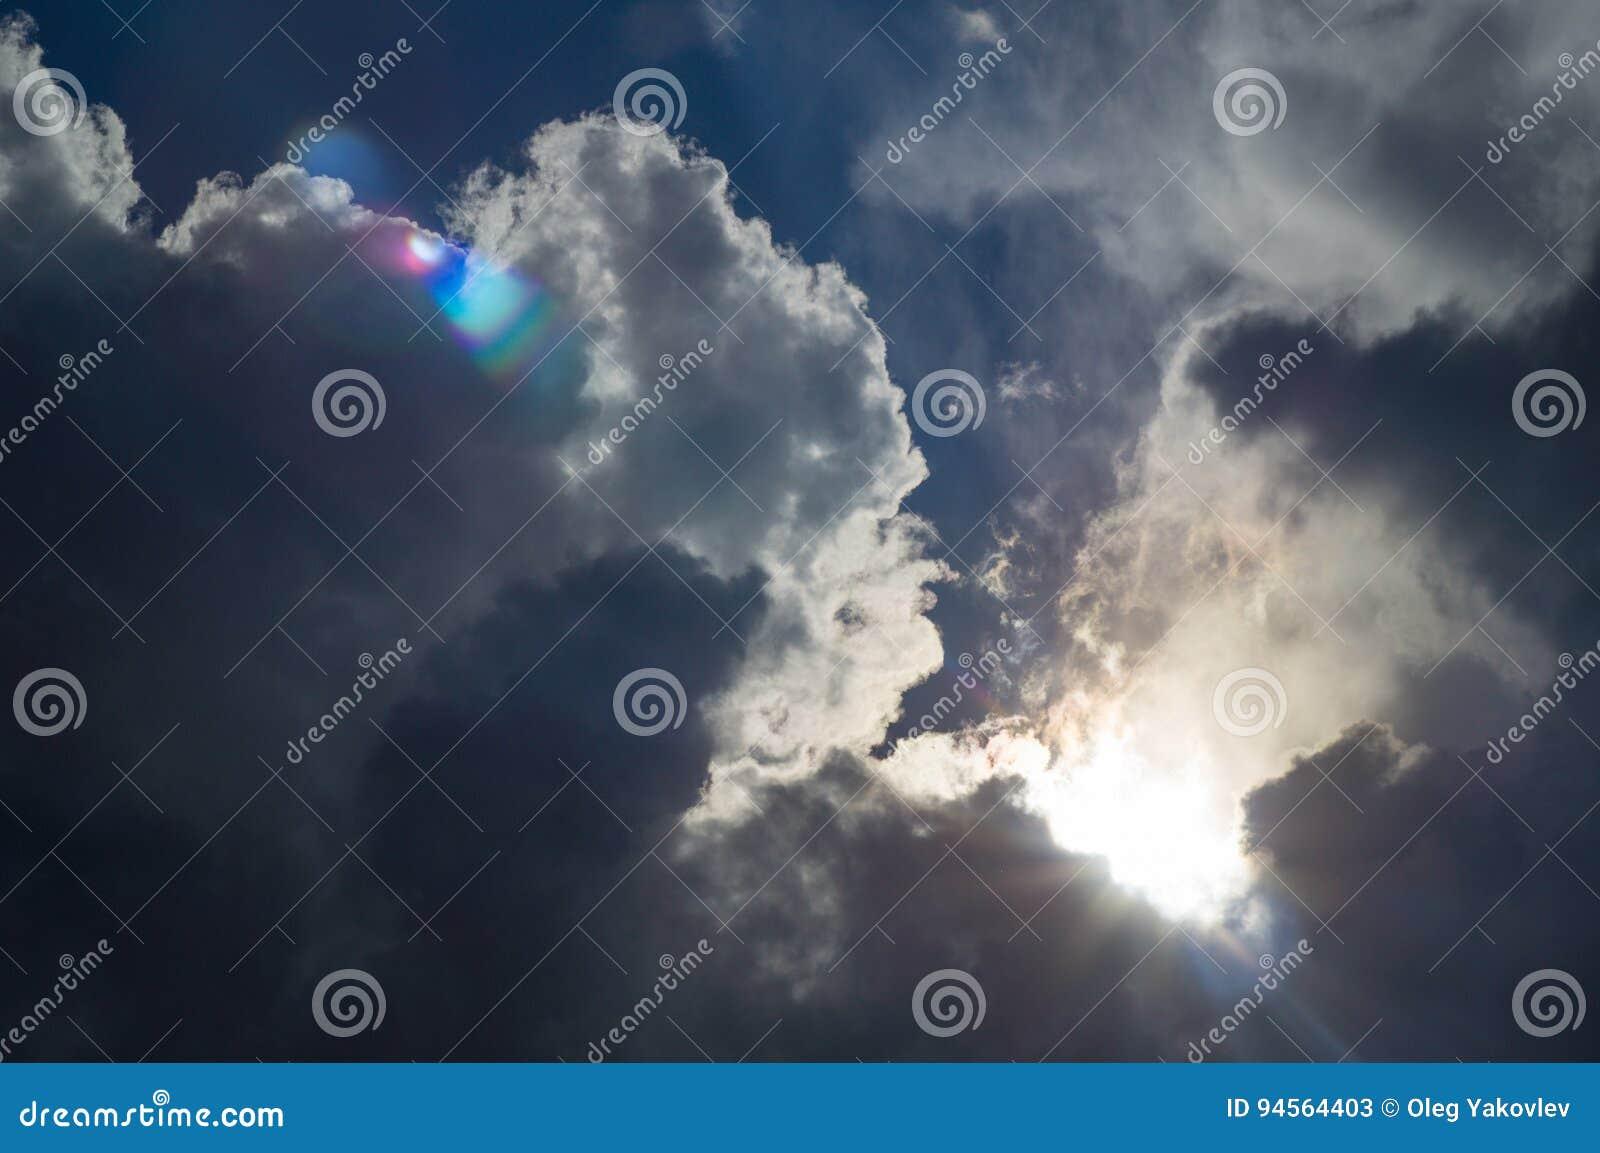 dark clouds in bad weather